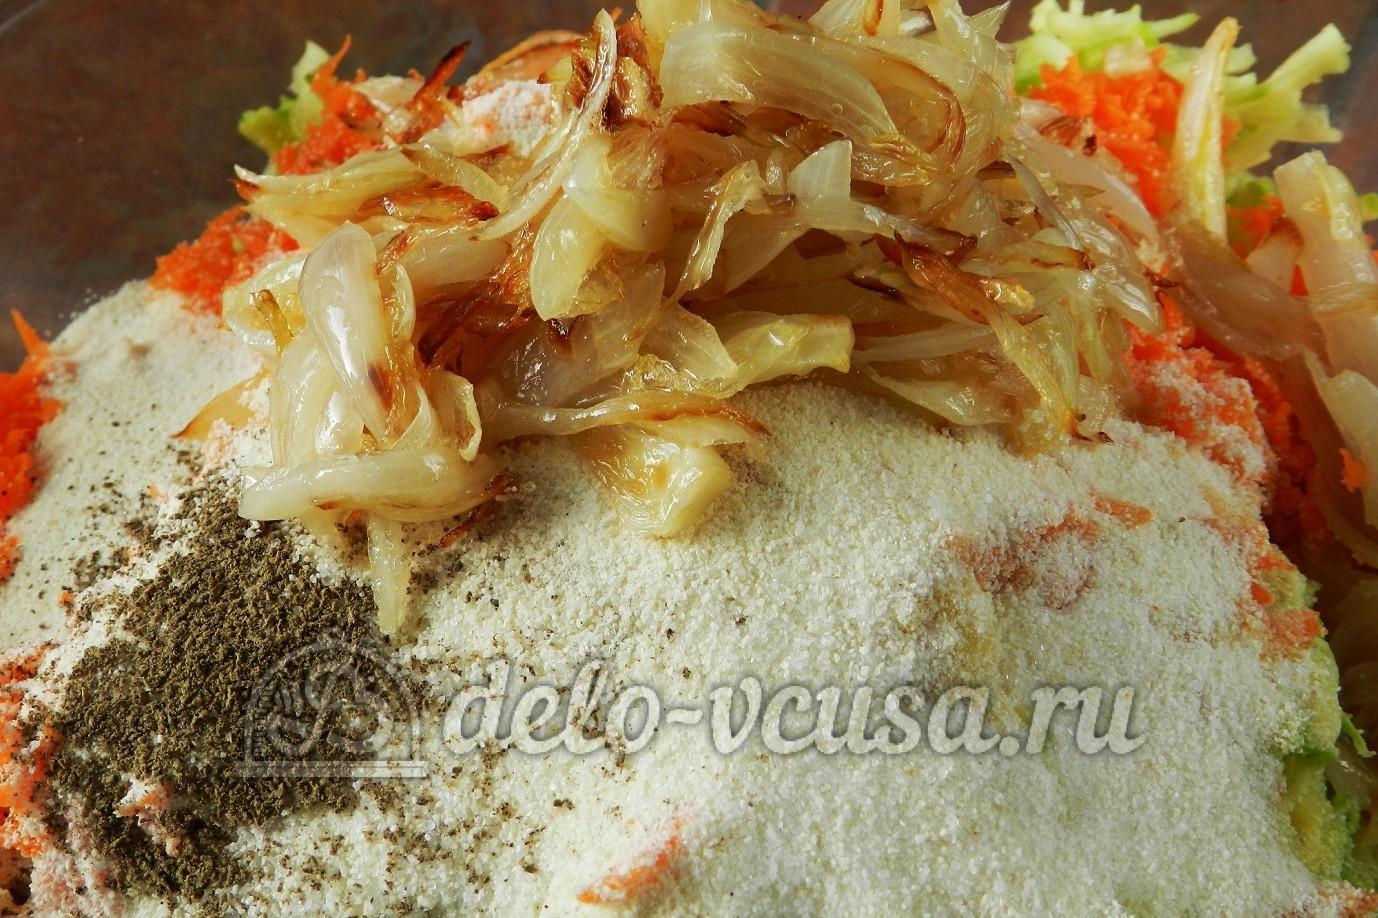 Кабачковый торт с морковью и луком рецепт с фото пошагово 96